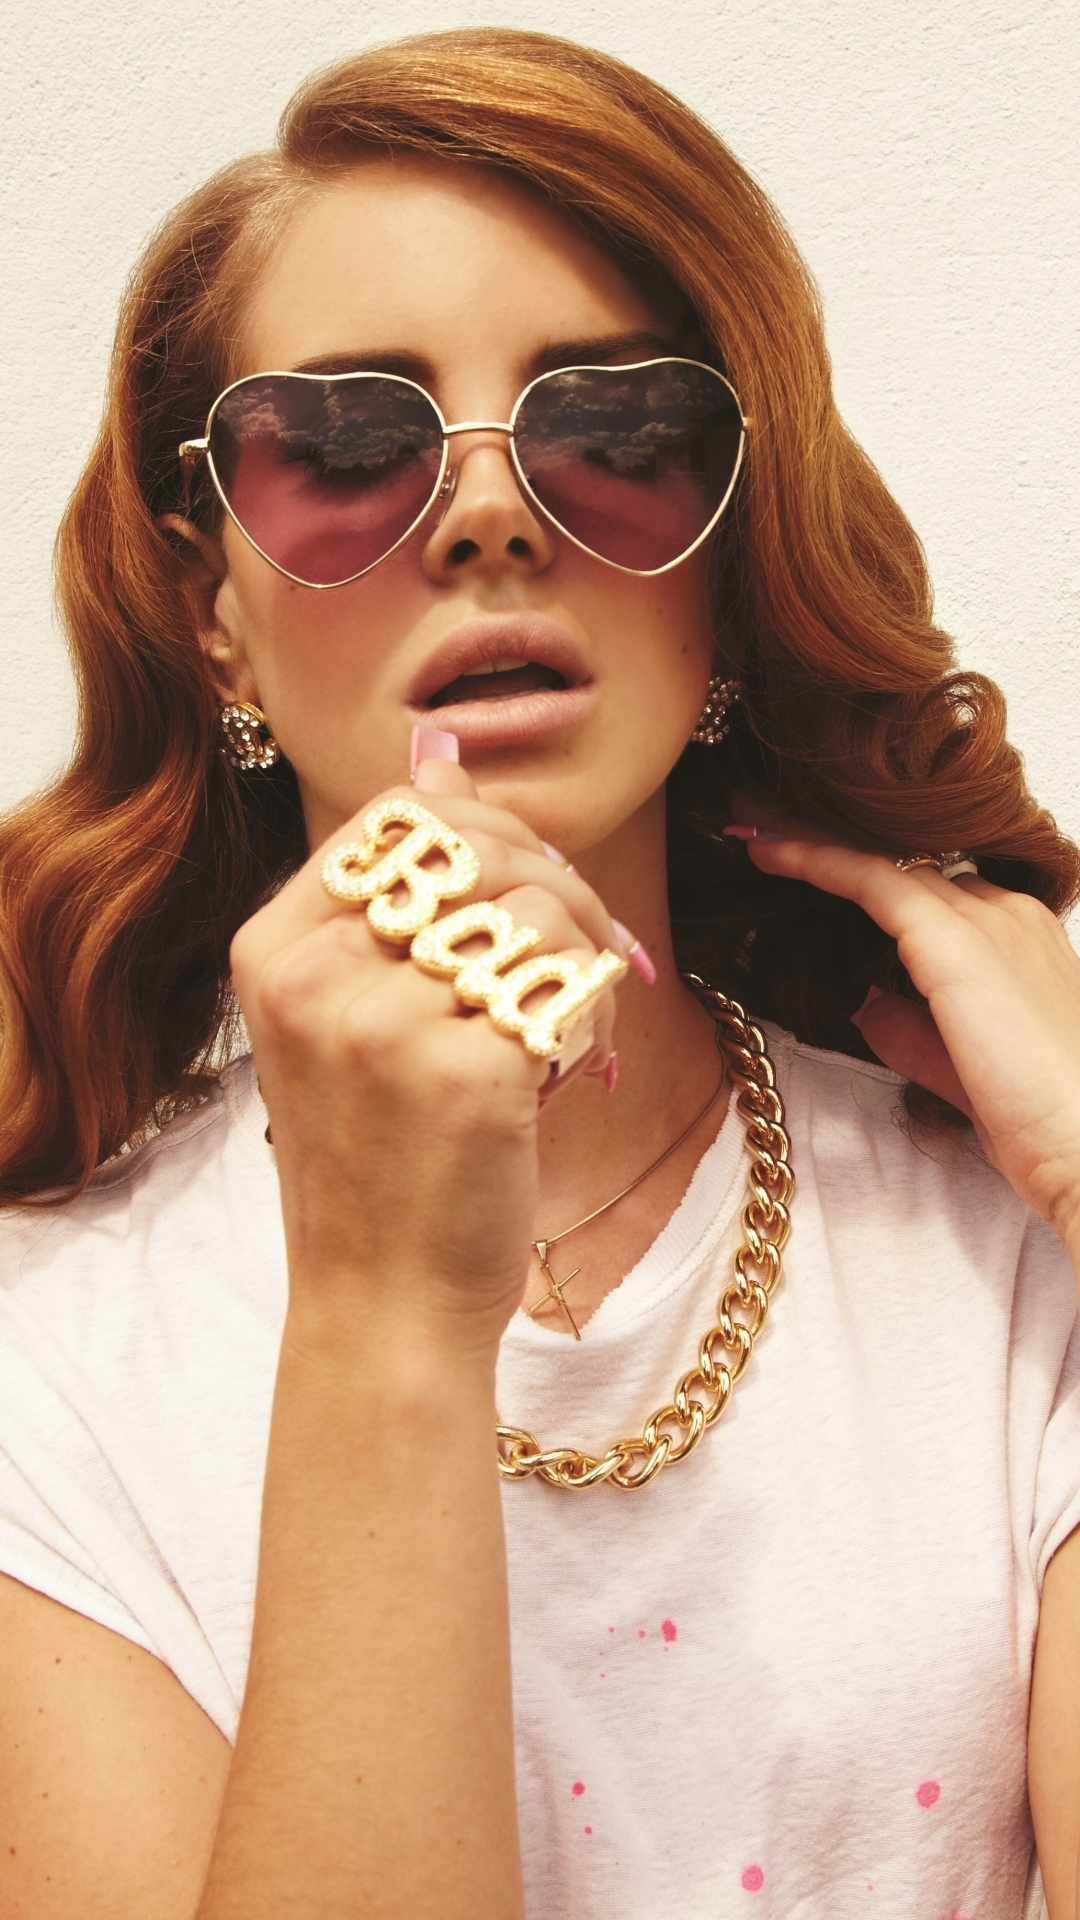 10 Most Popular Lana Del Rey Phone Wallpaper FULL HD 1920× ...